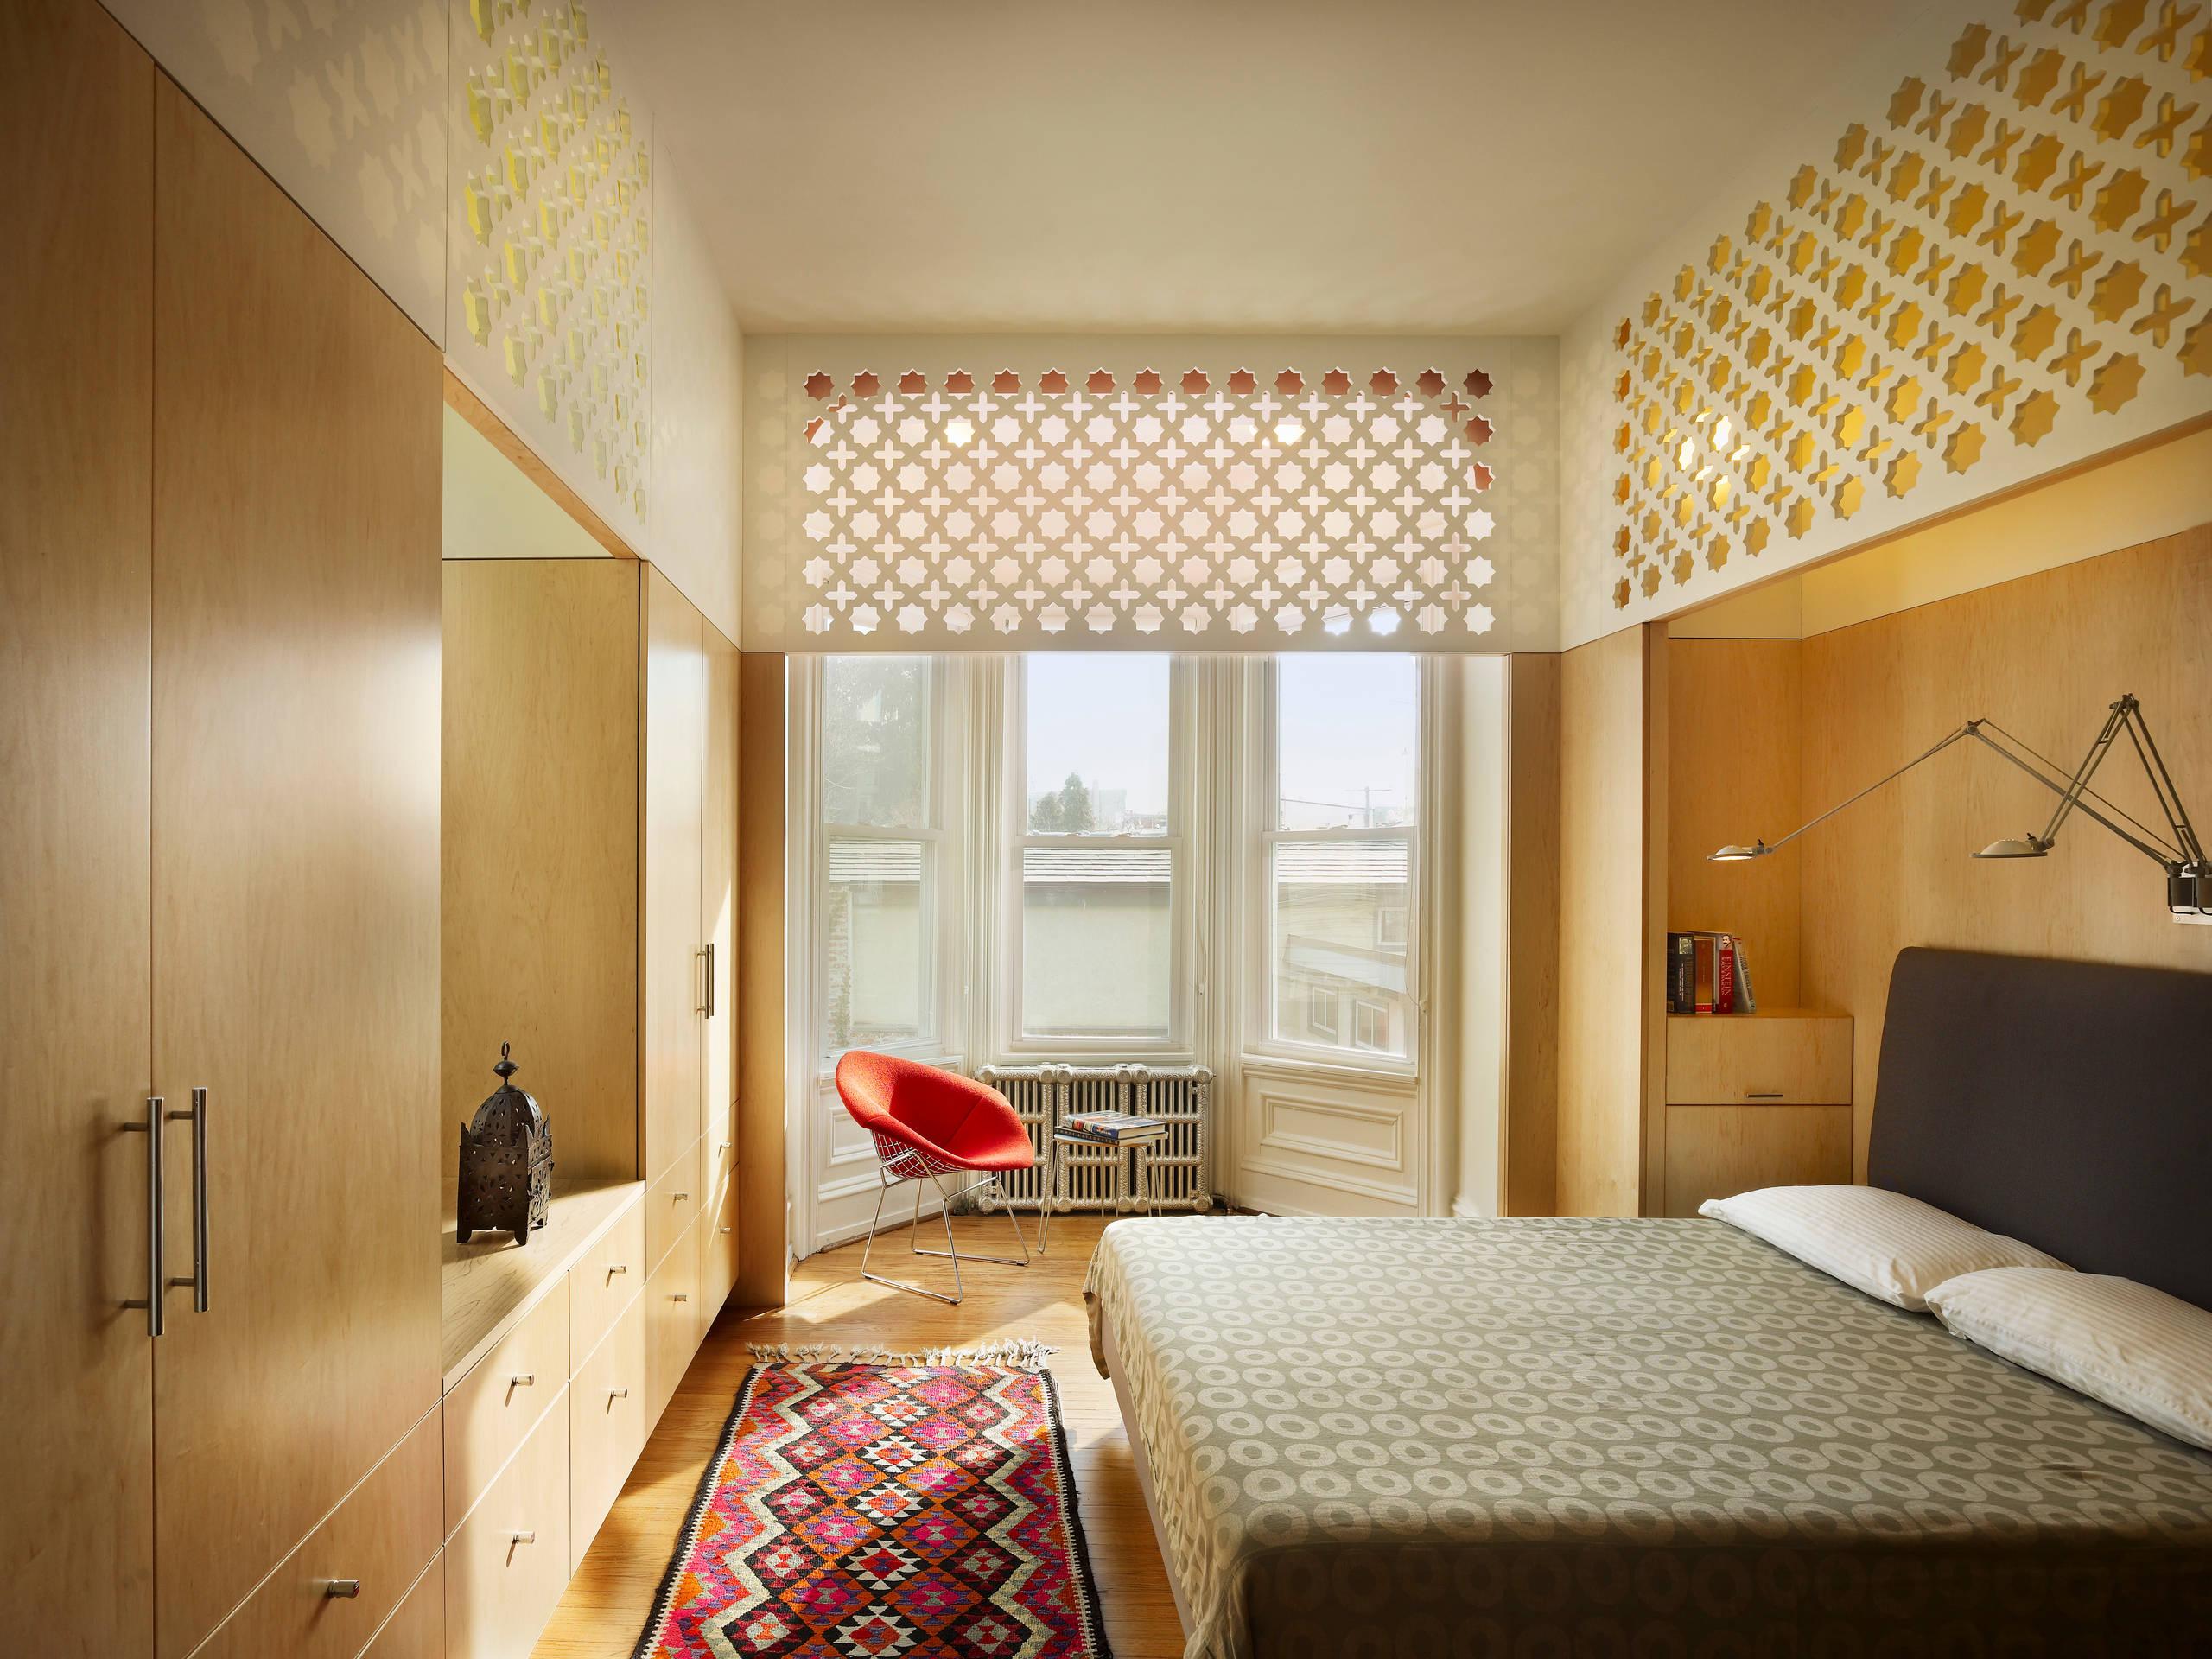 captivating beach chic master bedroom | 18 Captivating Mediterranean Bedroom Designs You Won't ...